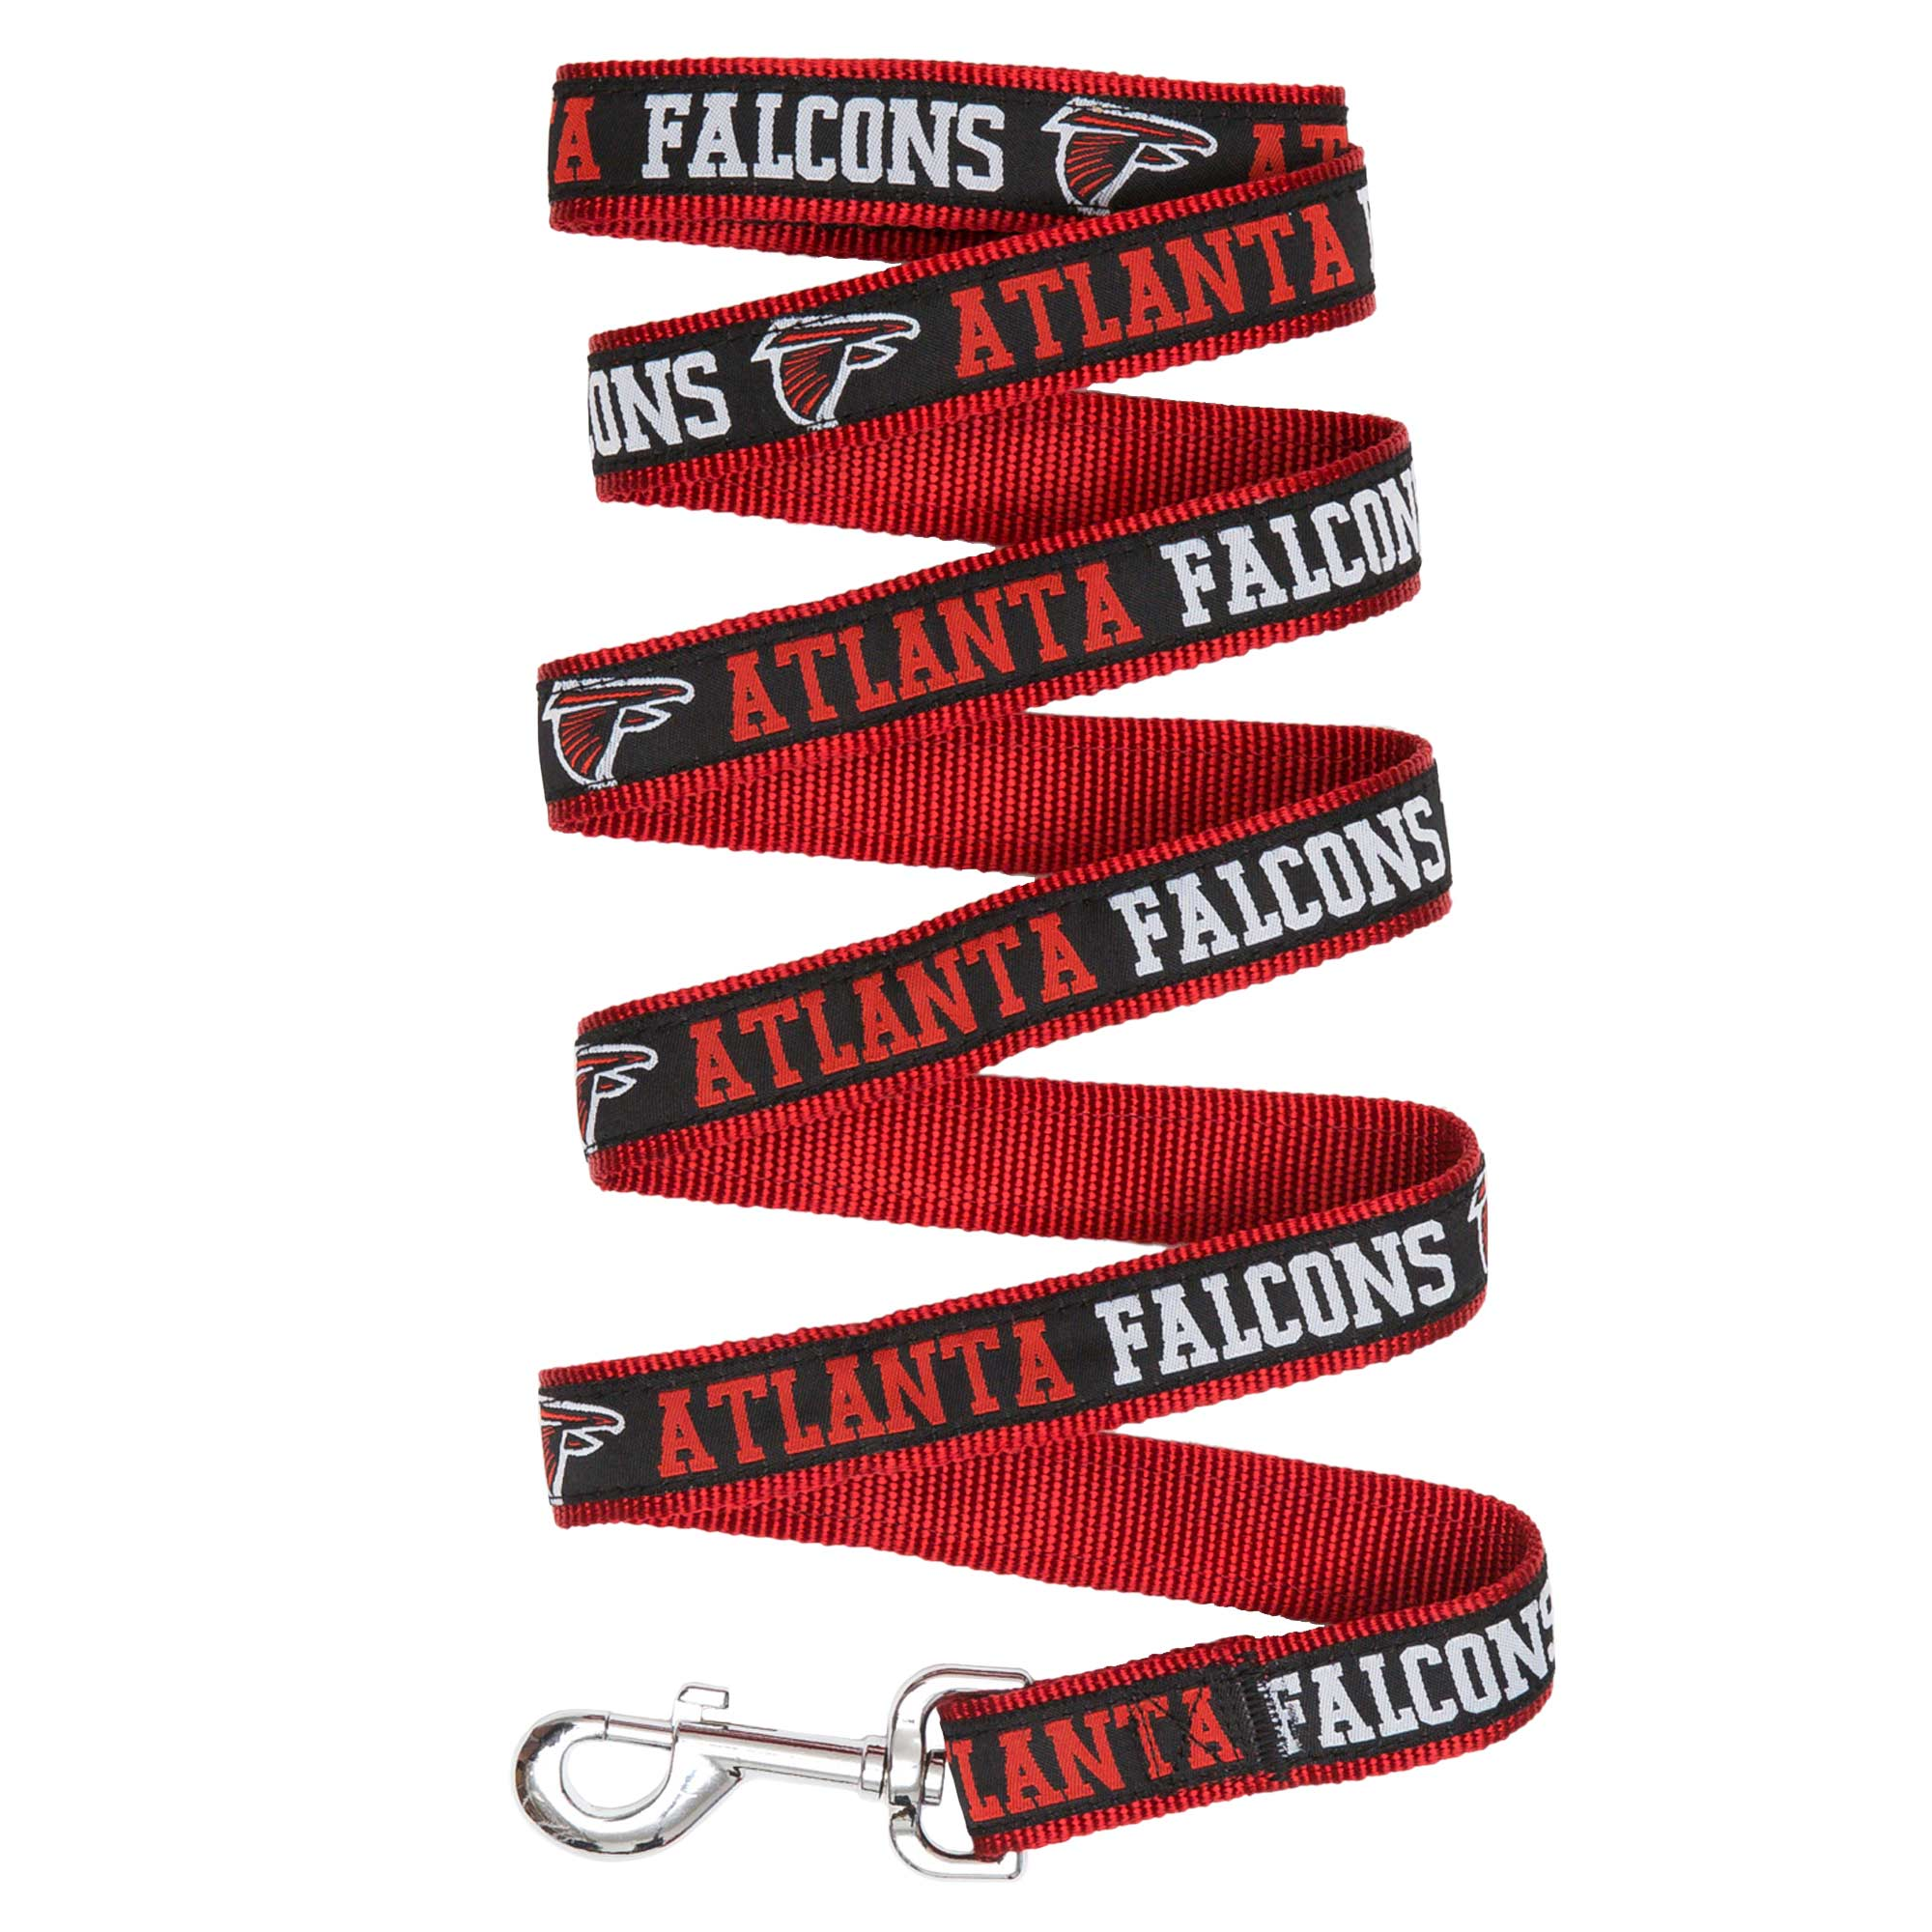 Atlanta Falcons Leash